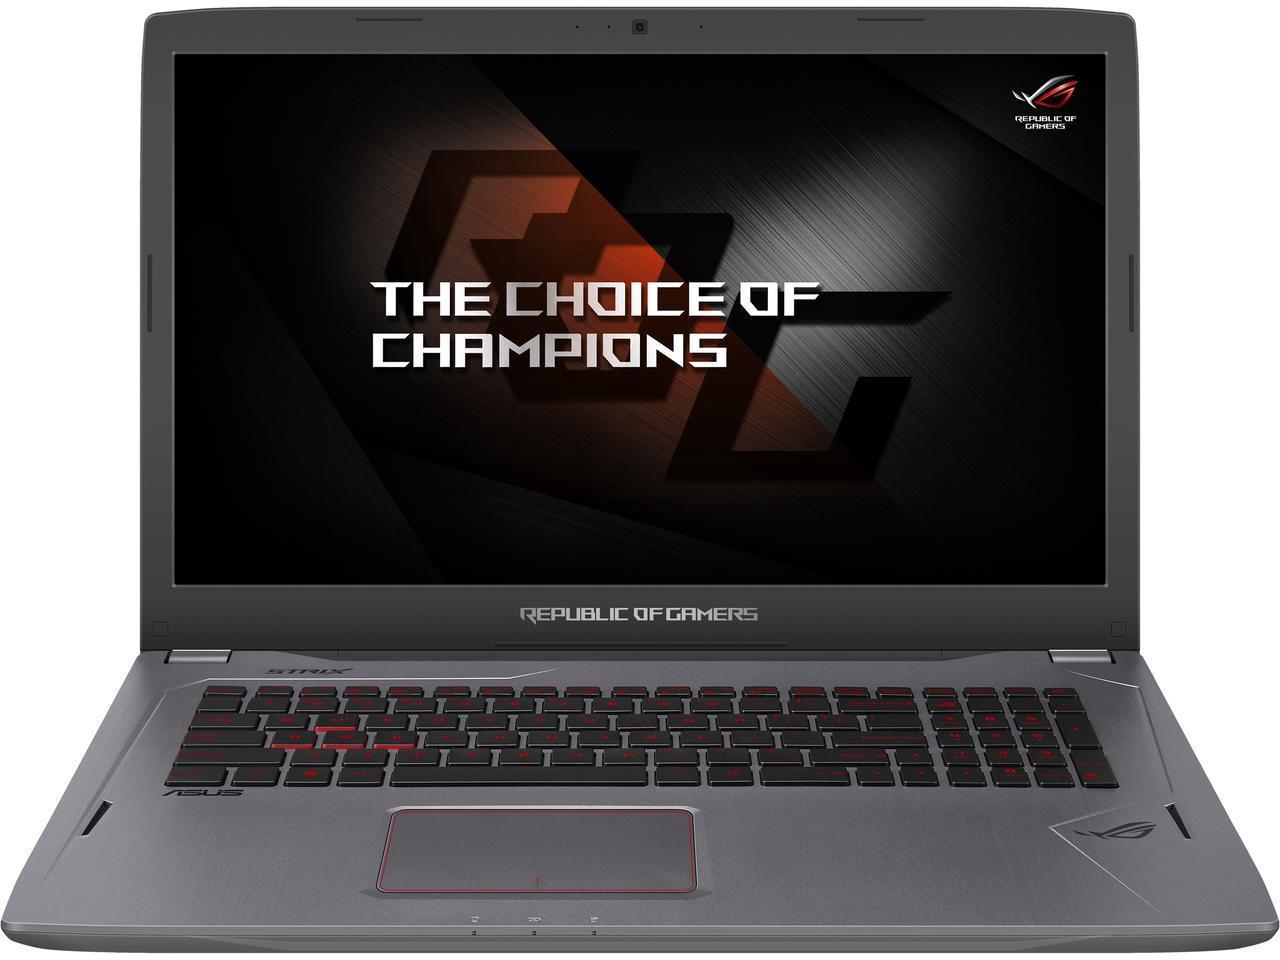 Asus ROG Strix GL702VS-AH73 Gaming Laptop: 17.3'' FHD 75 Hz G-Sync, i7-7700HQ, 12GB DDR4, GTX 1070, 128GB SSD, 1TB HDD, Thunderbolt 3, Win10H @ $1349 + F/S